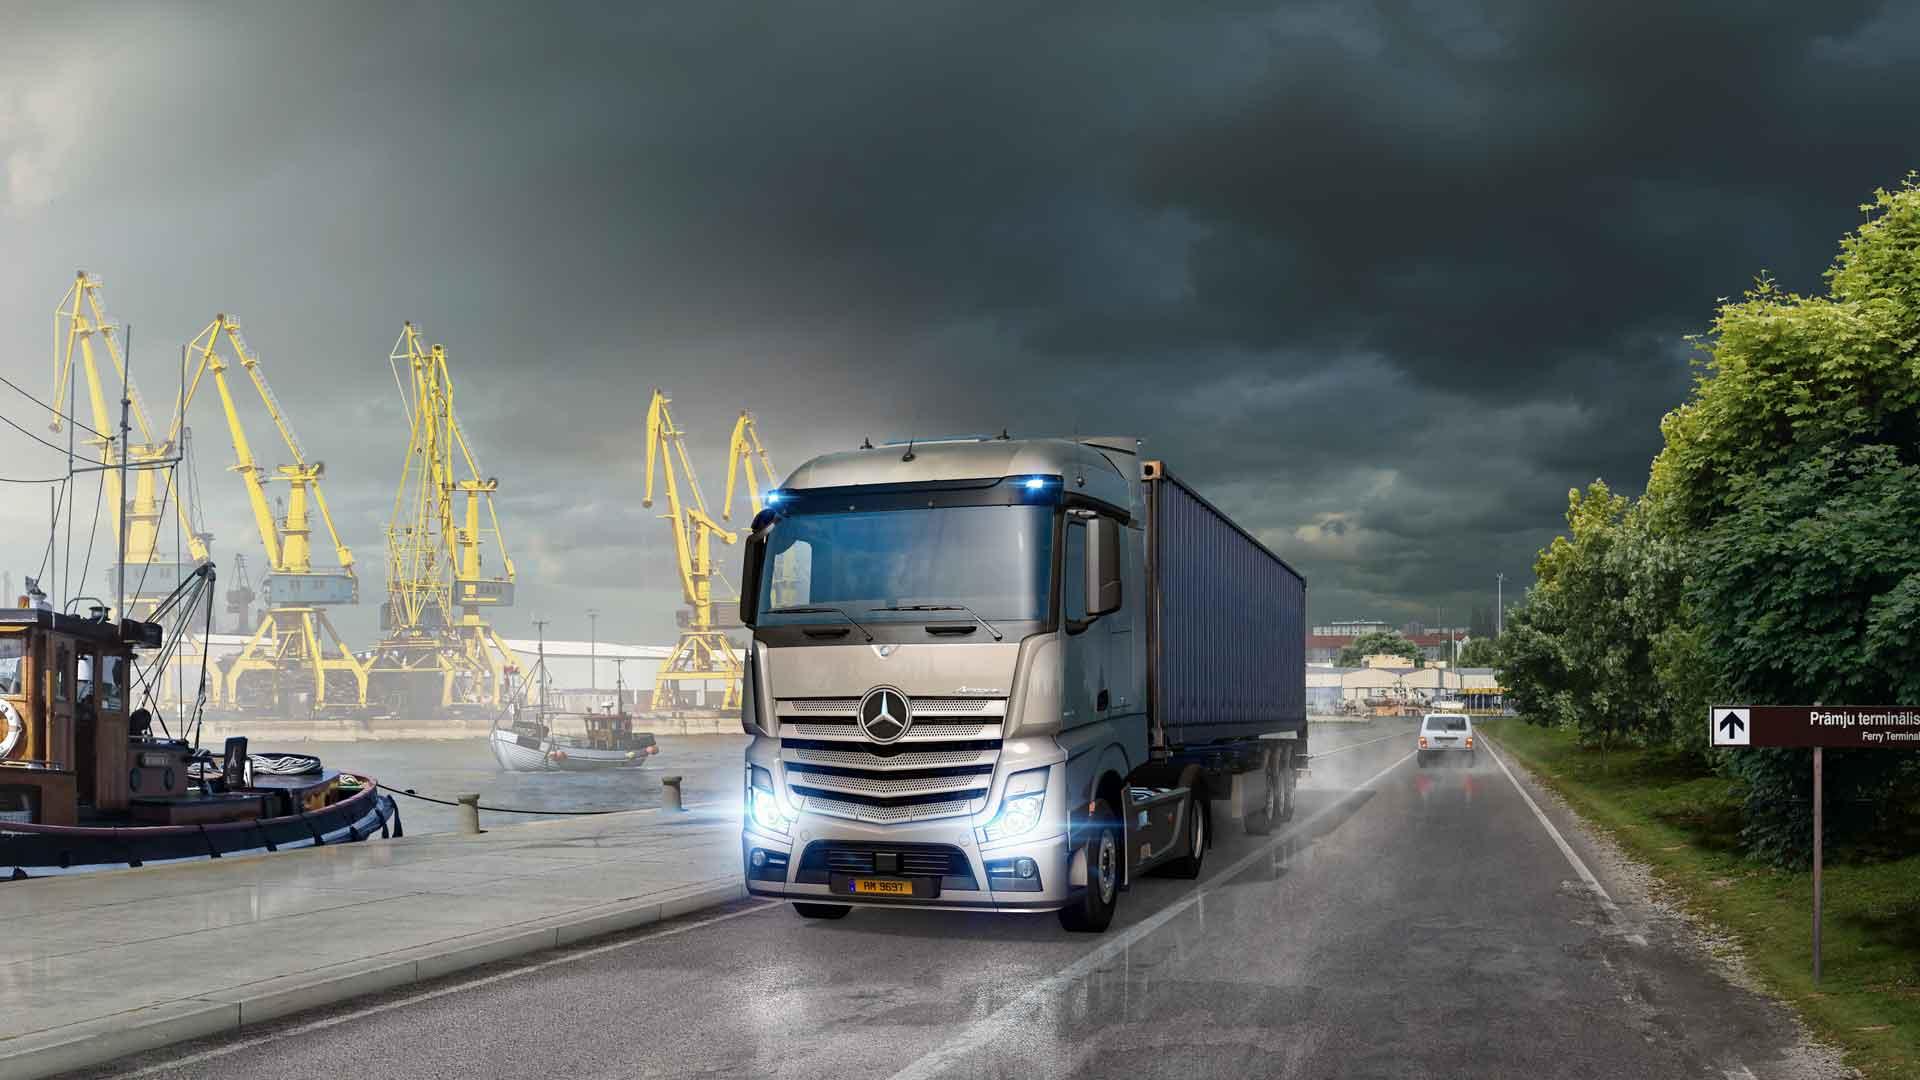 euro truck simulator 2 legendary edition astragon. Black Bedroom Furniture Sets. Home Design Ideas